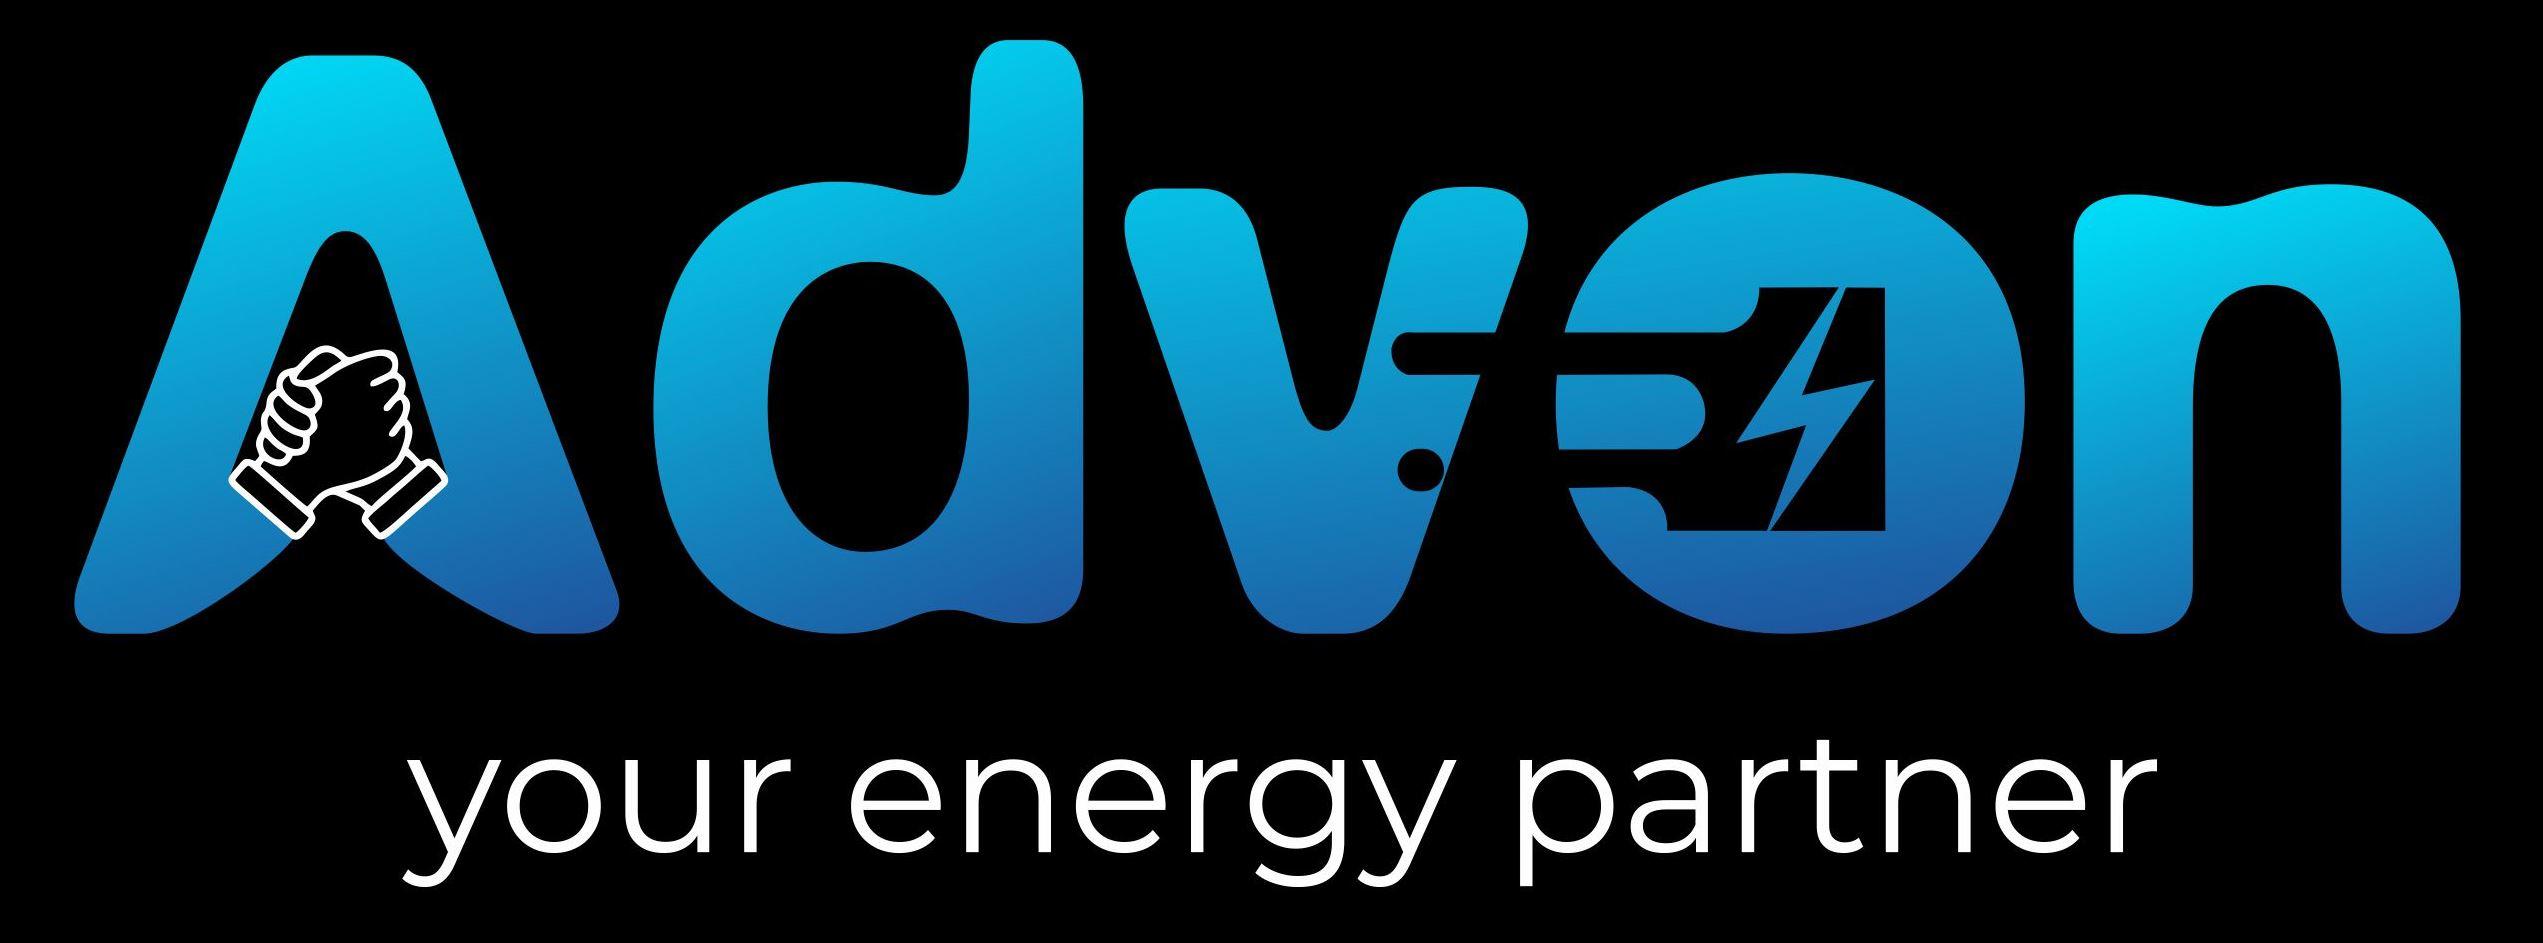 Advon – Inverter, Automotive Batteries, Solar Panels, Stabilizers